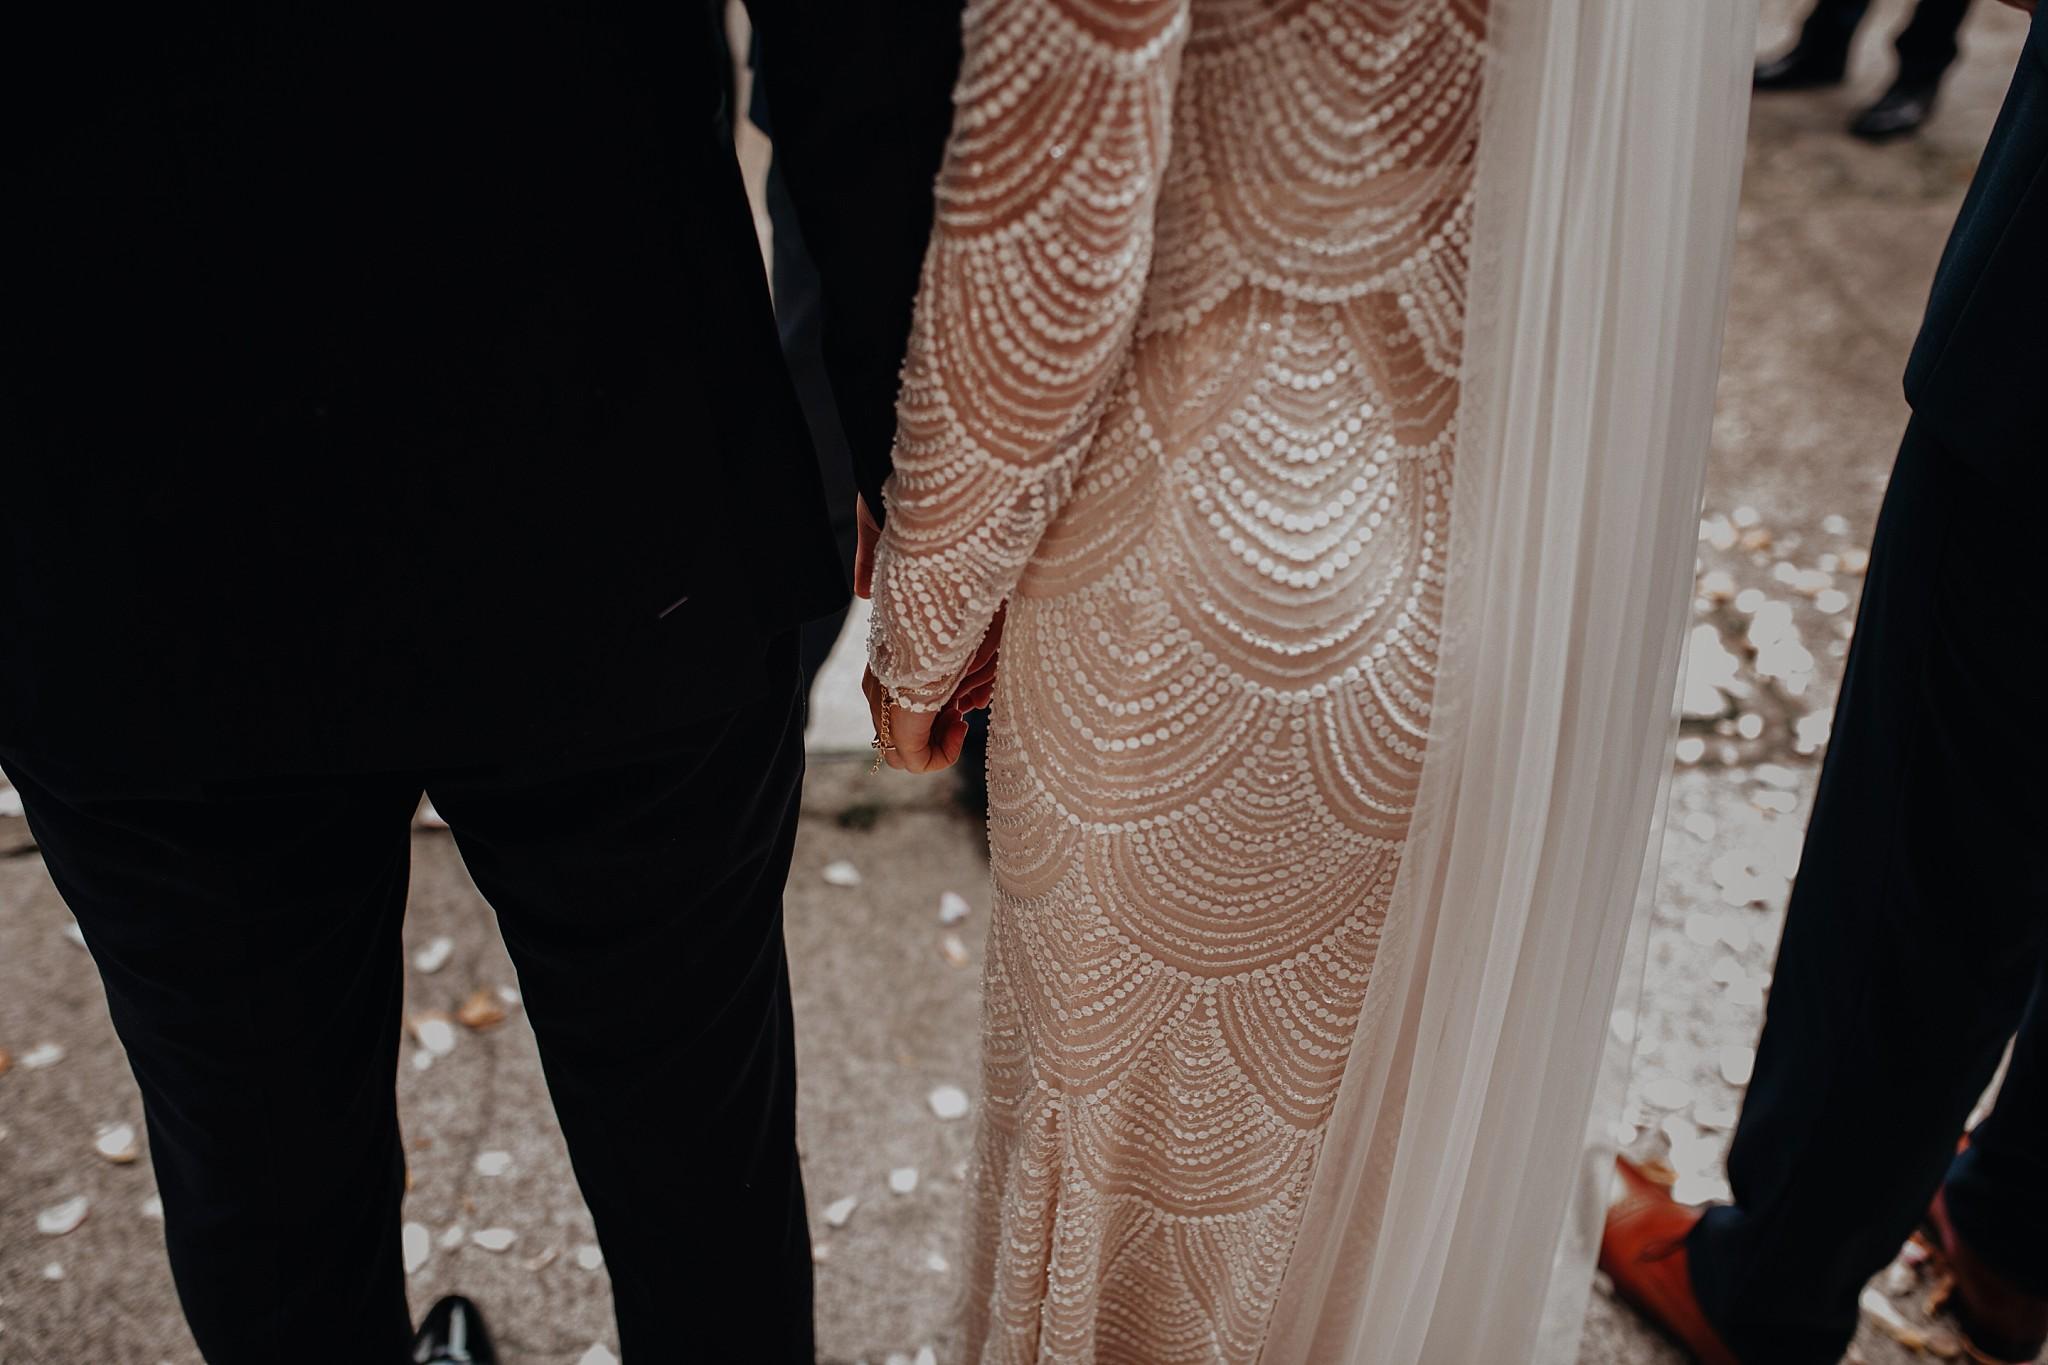 fotograf poznan wesele dobra truskawka piekne wesele pod poznaniem wesele w dobrej truskawce piekna para mloda slub marzen slub koronawirus slub listopad wesele koronawirus 228